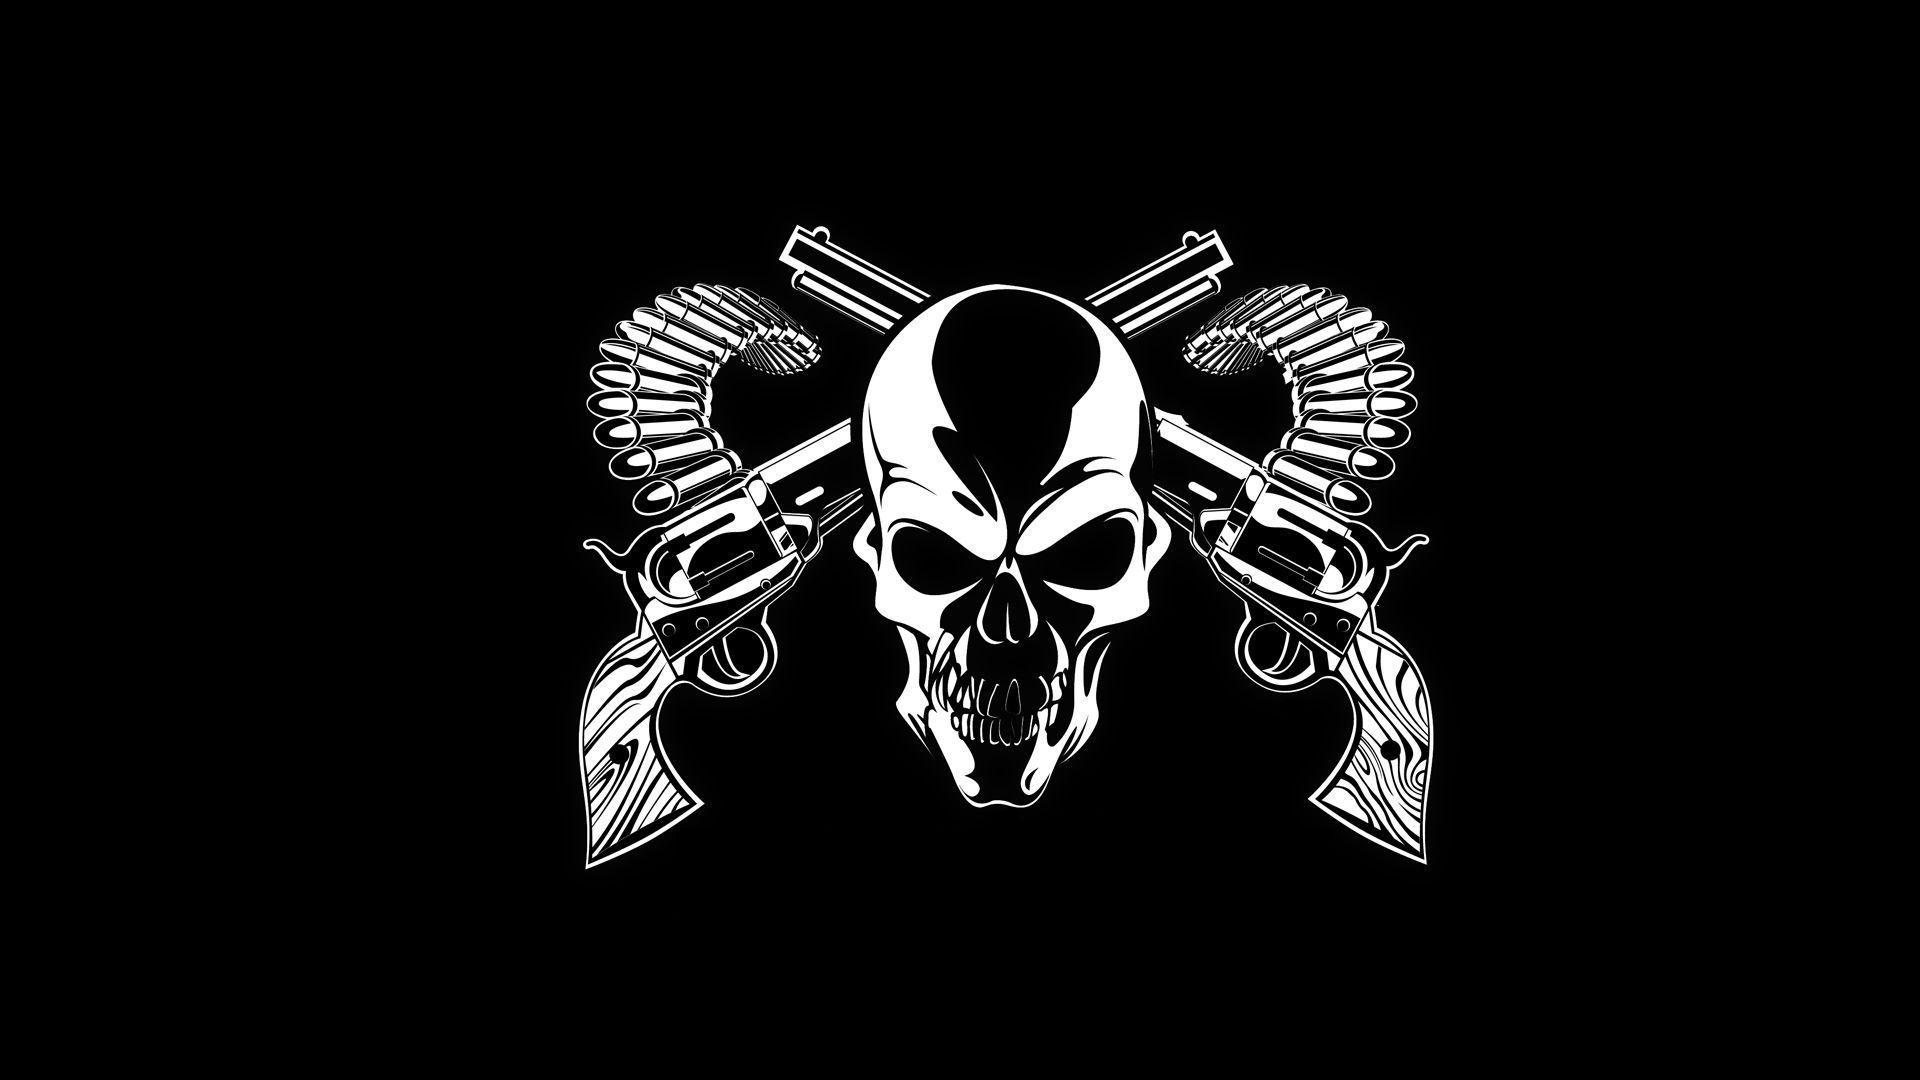 Unduh 93+ Background Hd Gangster Terbaik